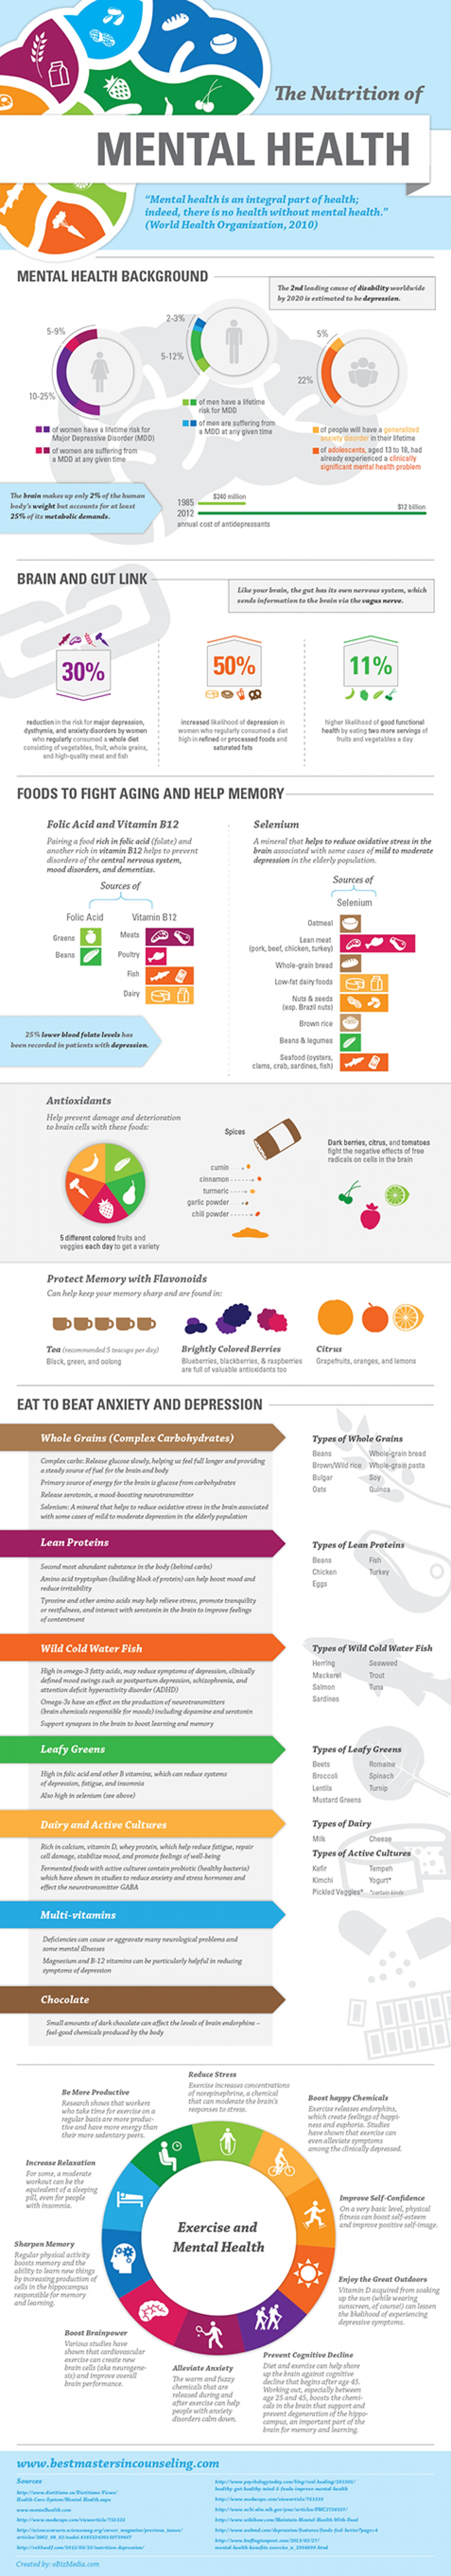 mental-health-nutrition.jpg